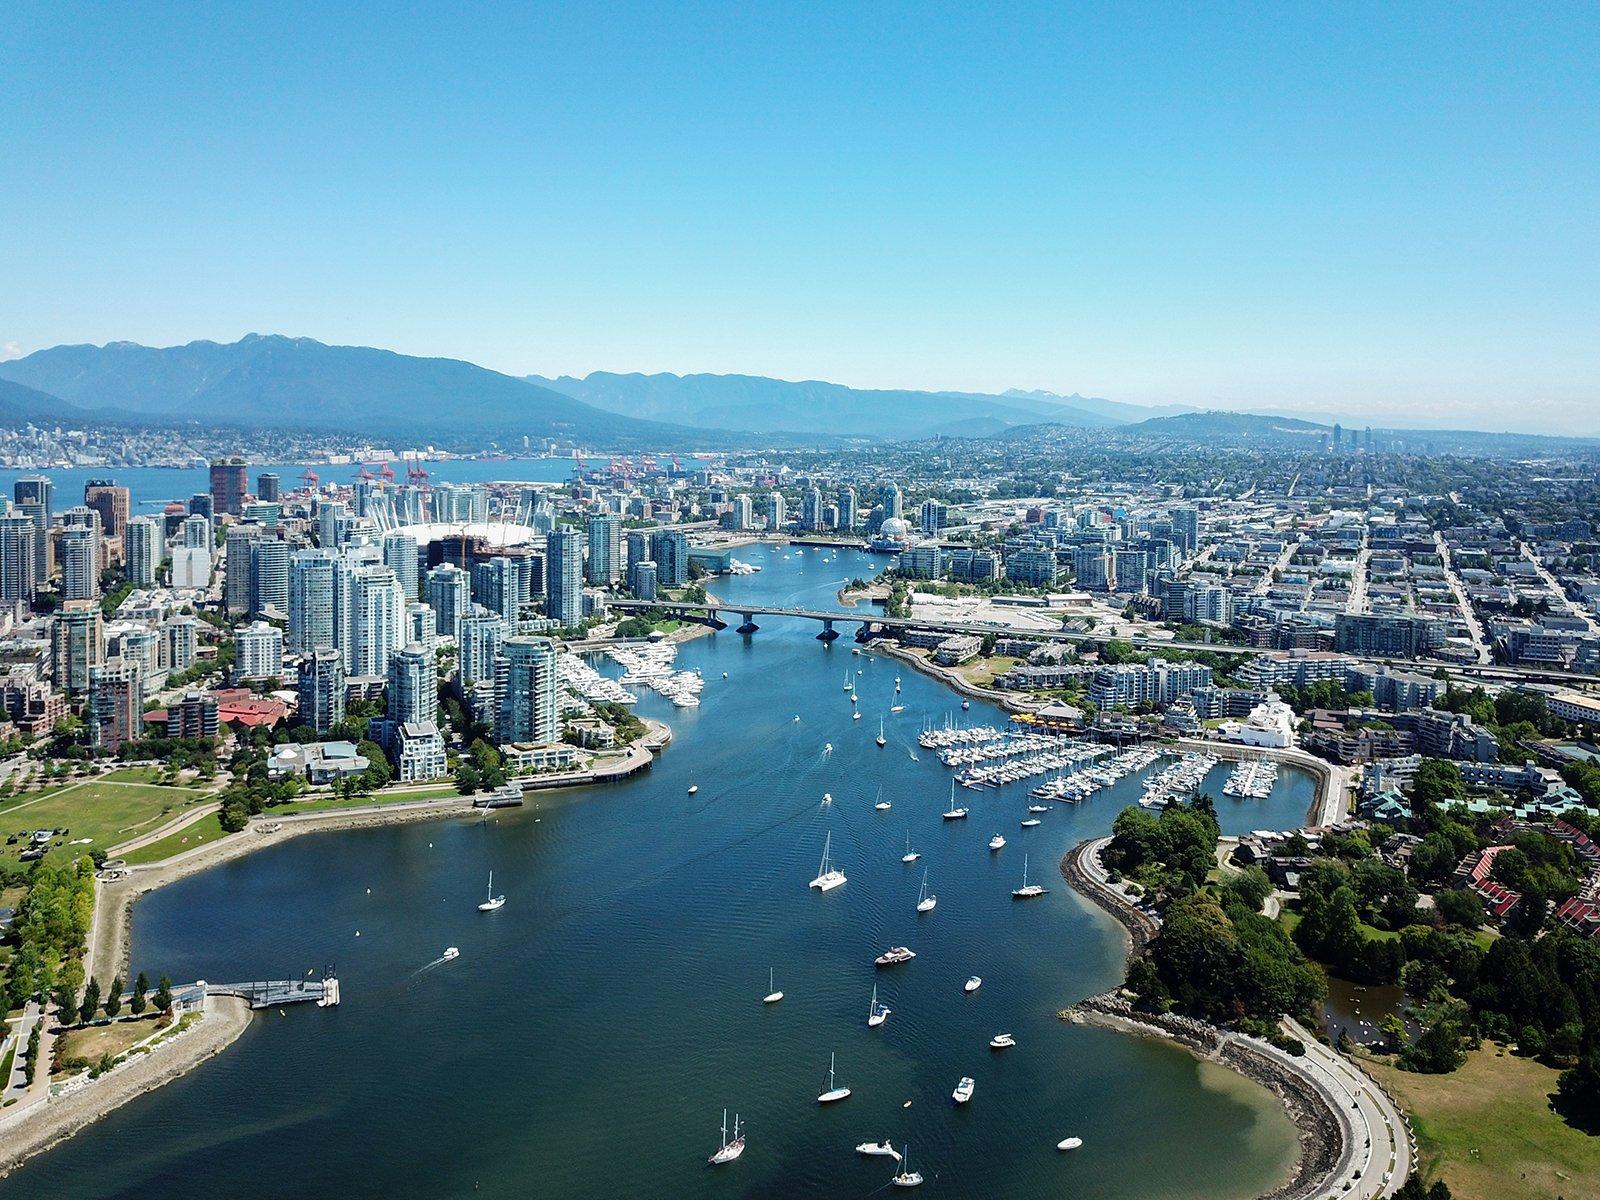 Photo 12: Photos: 803 1708 Ontario Street in Vancouver: False Creek Condo for sale (Vancouver East)